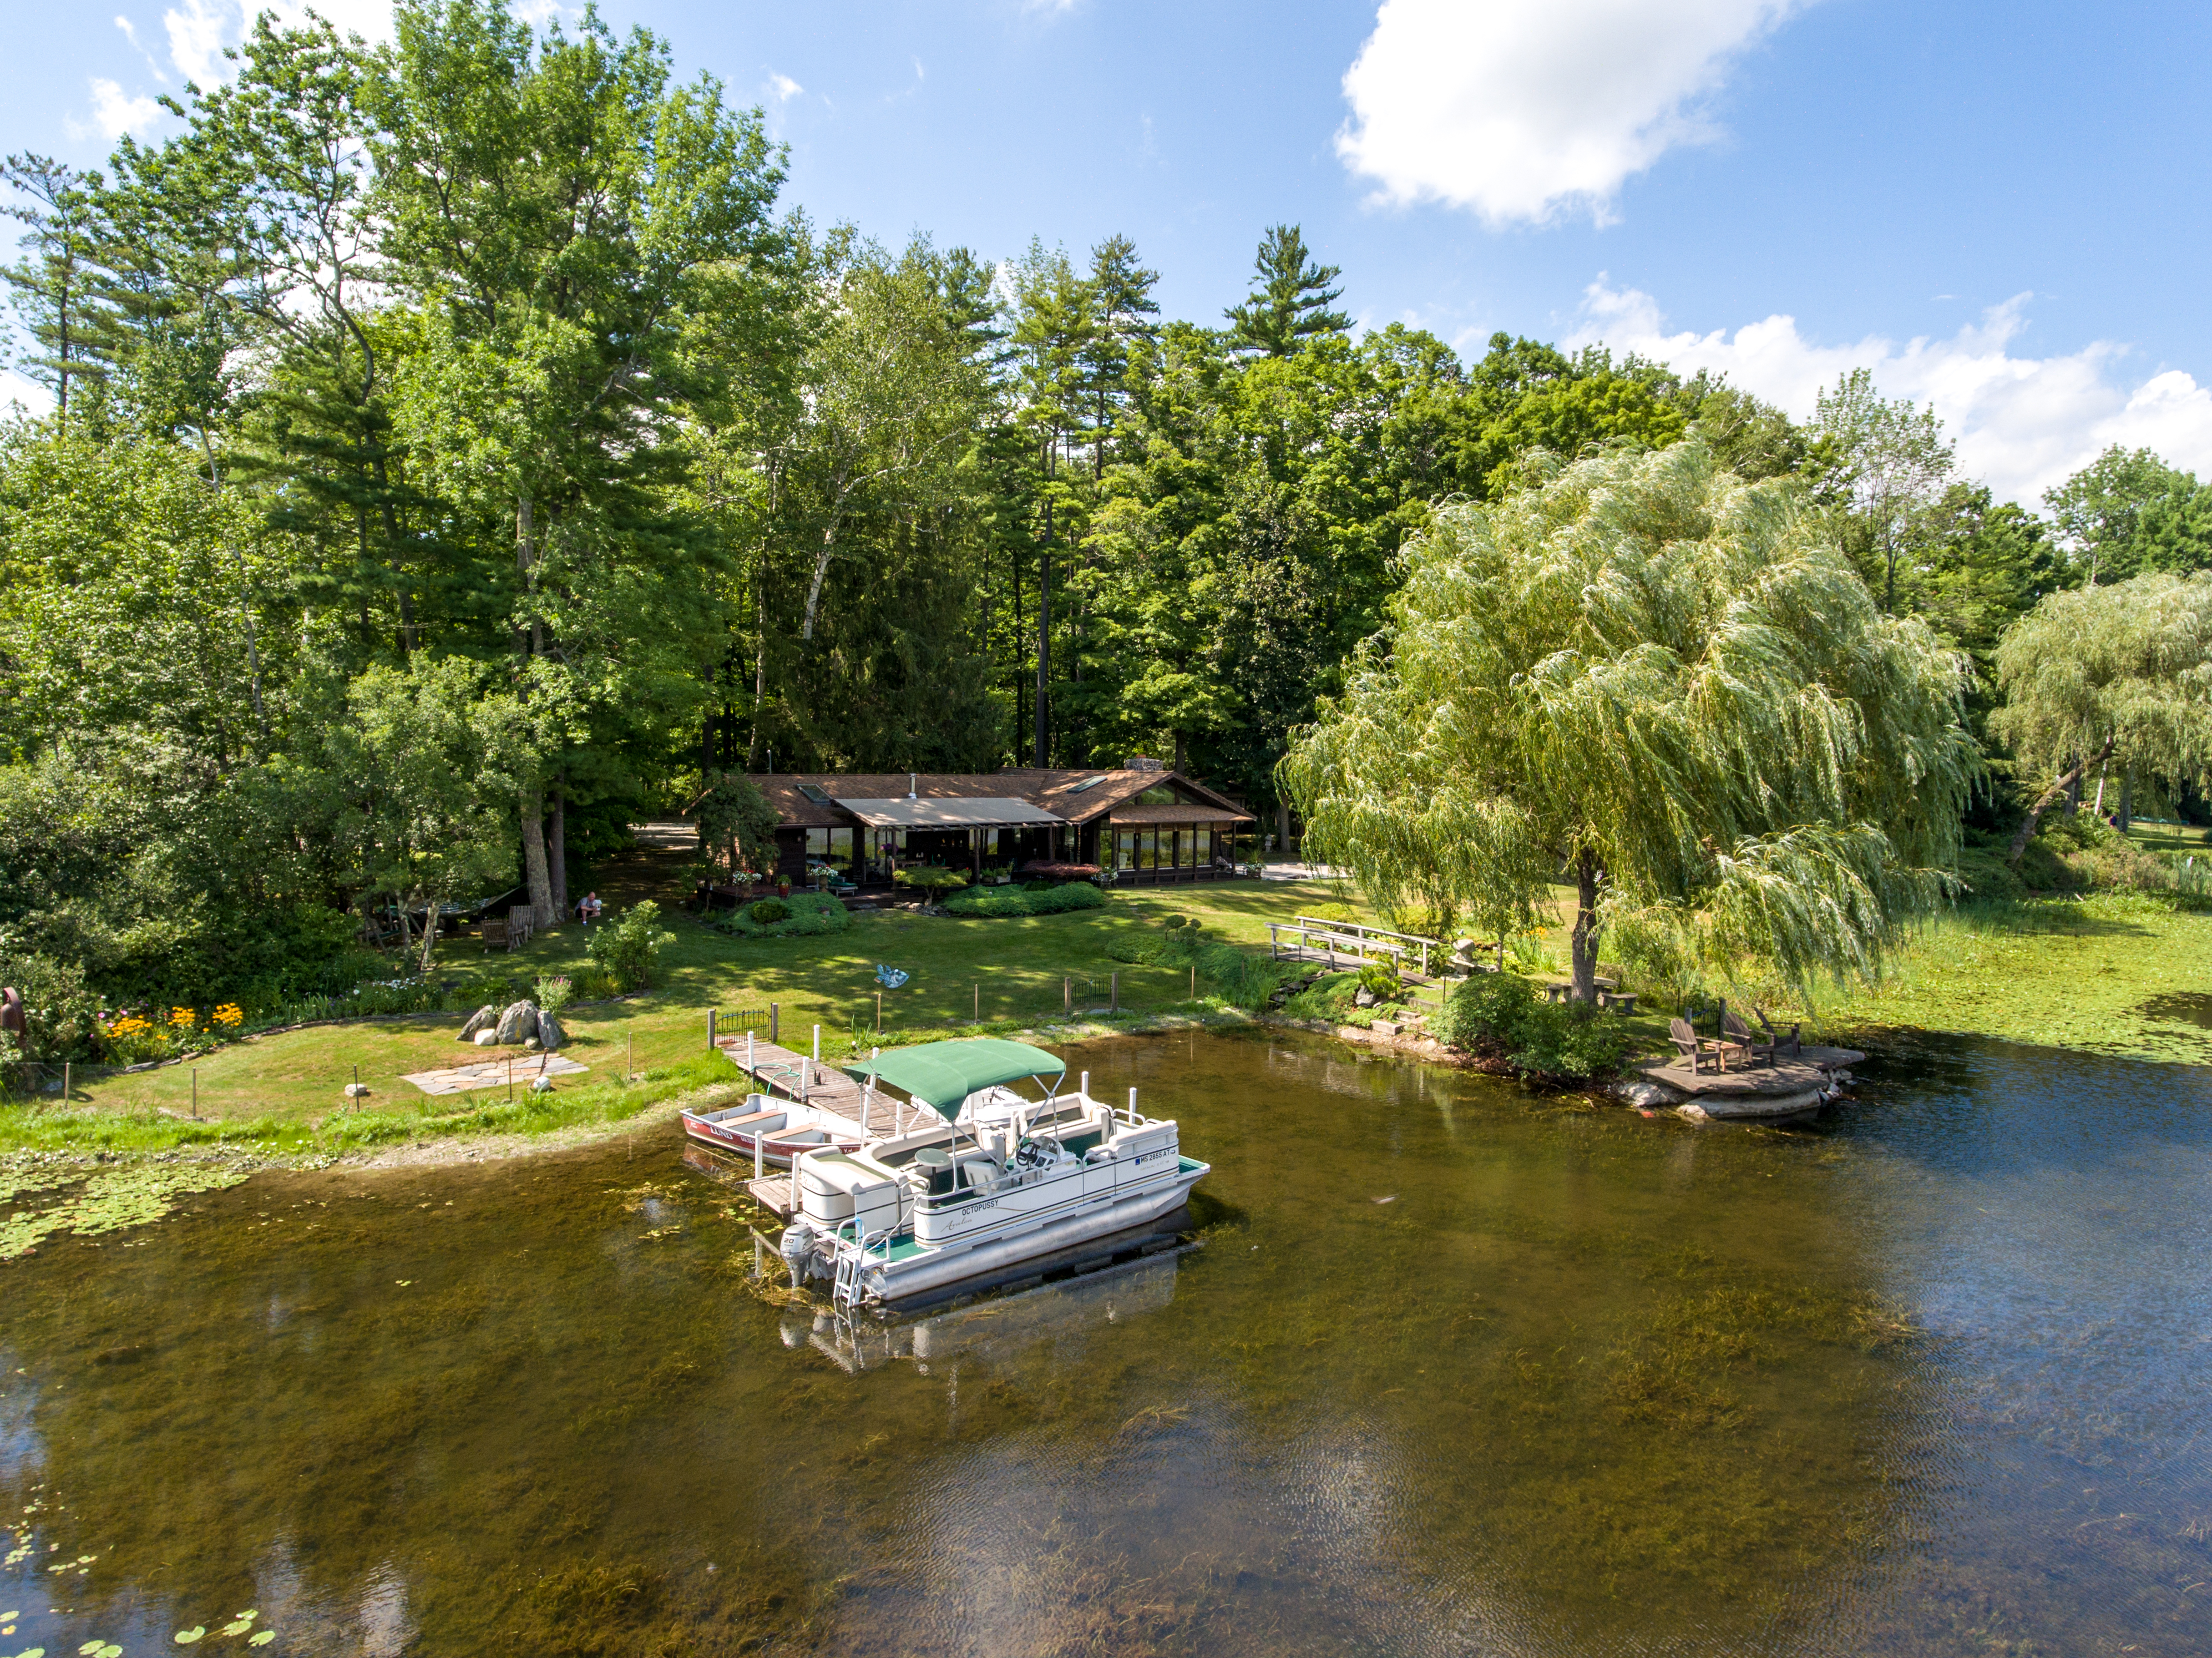 独户住宅 为 销售 在 Lakefront Paradise on Magical Stockbridge Bowl 46 Lake Dr 克布里奇, 马萨诸塞州 01262 美国